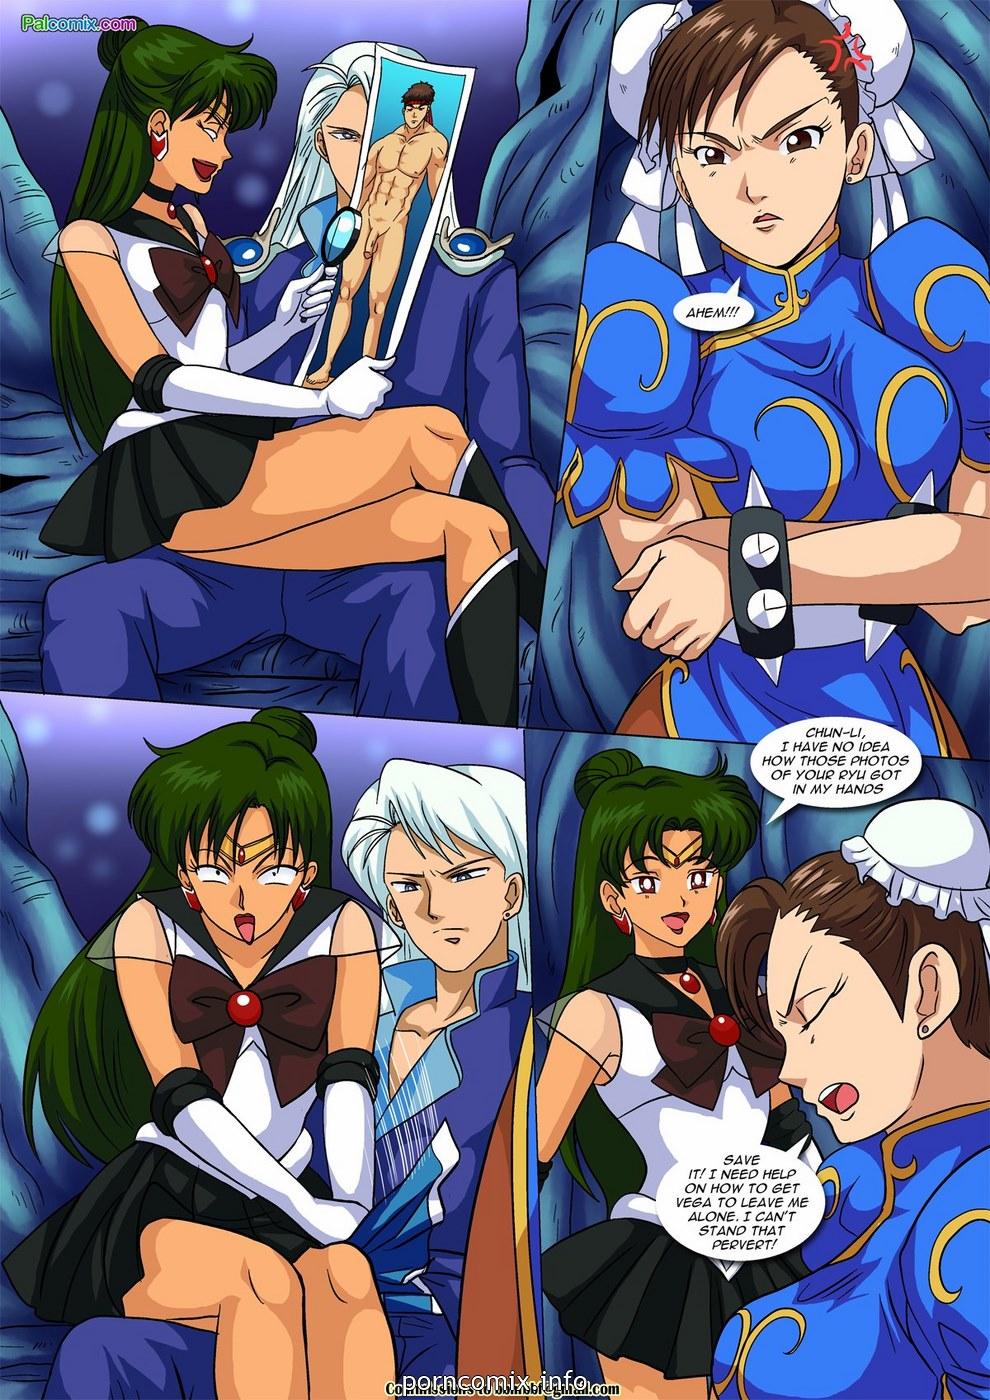 Vega vs Chun Li - Crotch Wars